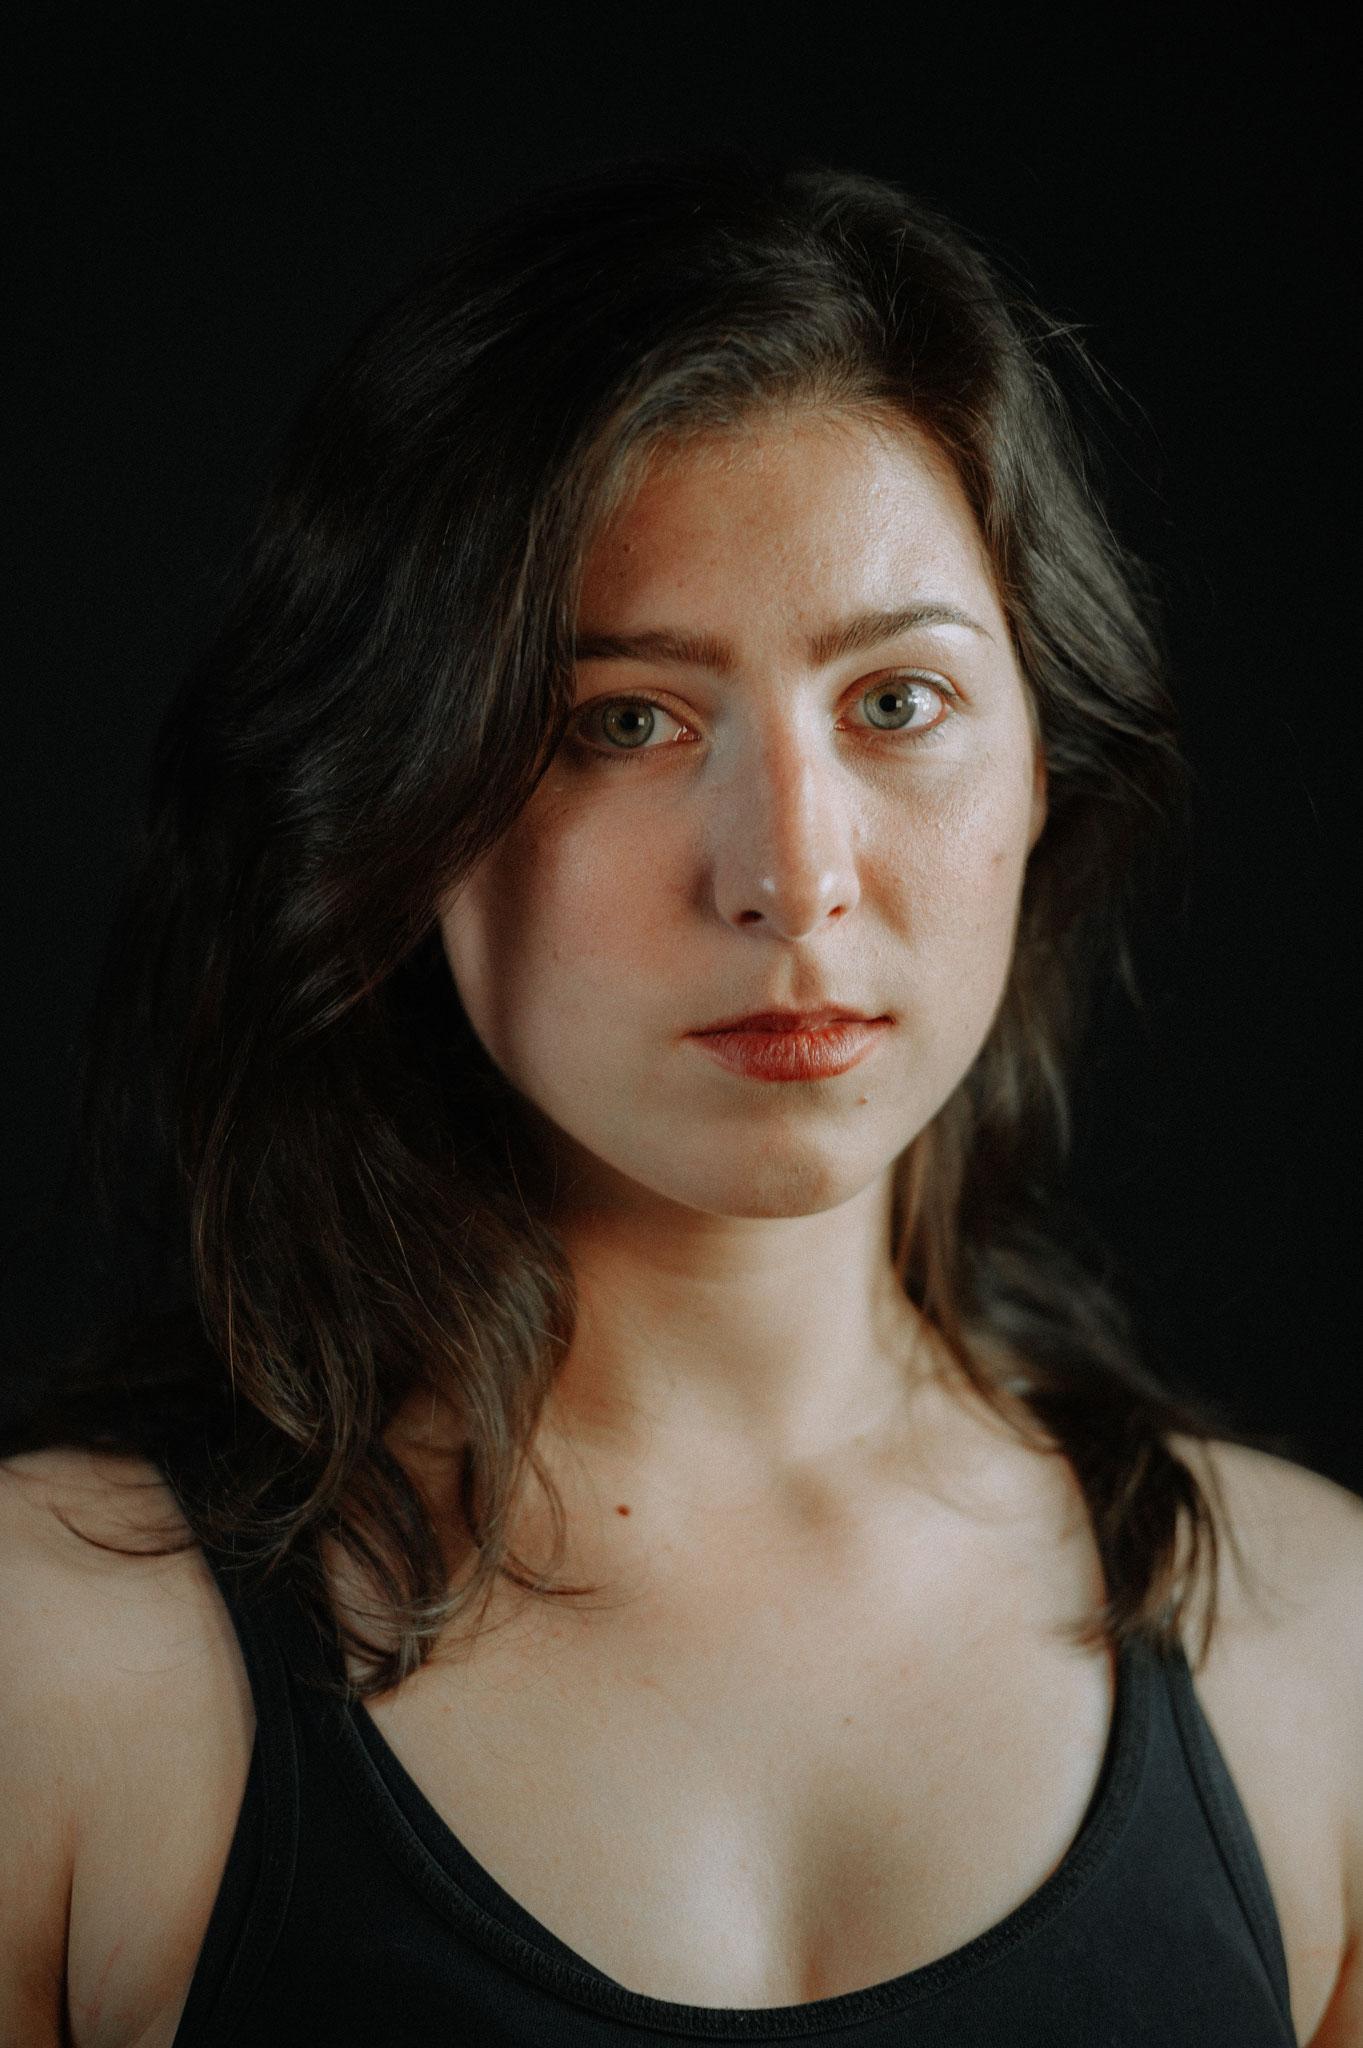 Foto: Dino Bossnini - MakeUp: Sara Mehadzic (2020)